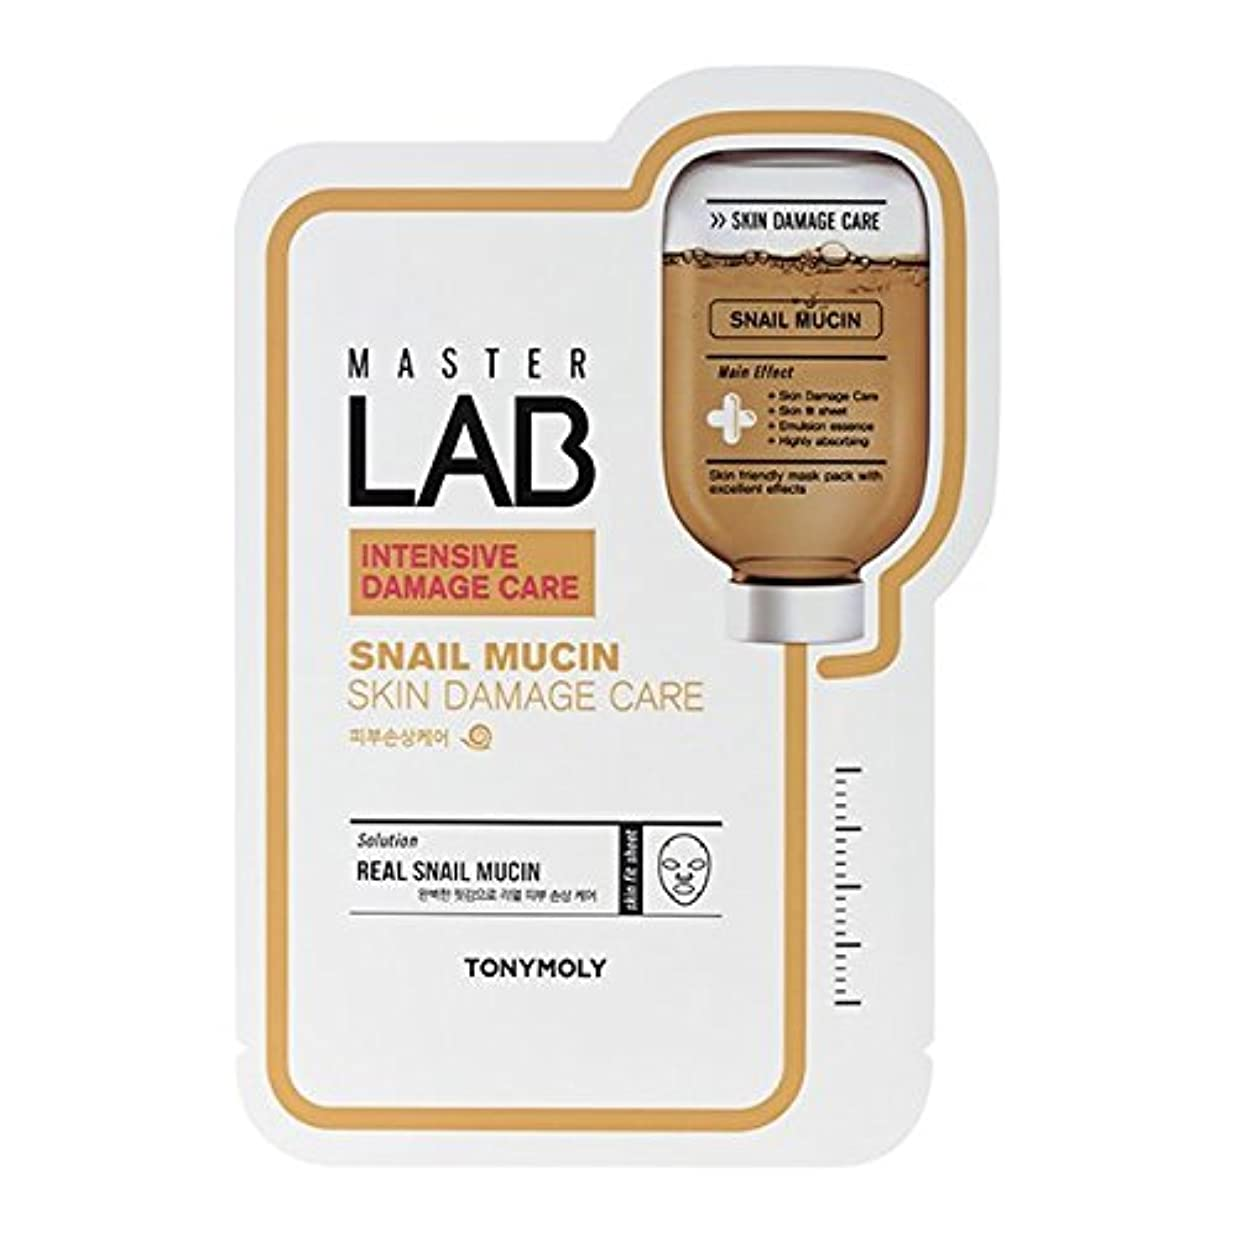 TONYMOLY Master Lab Mask Snail Mucin (Skin Damage Care) (並行輸入品)